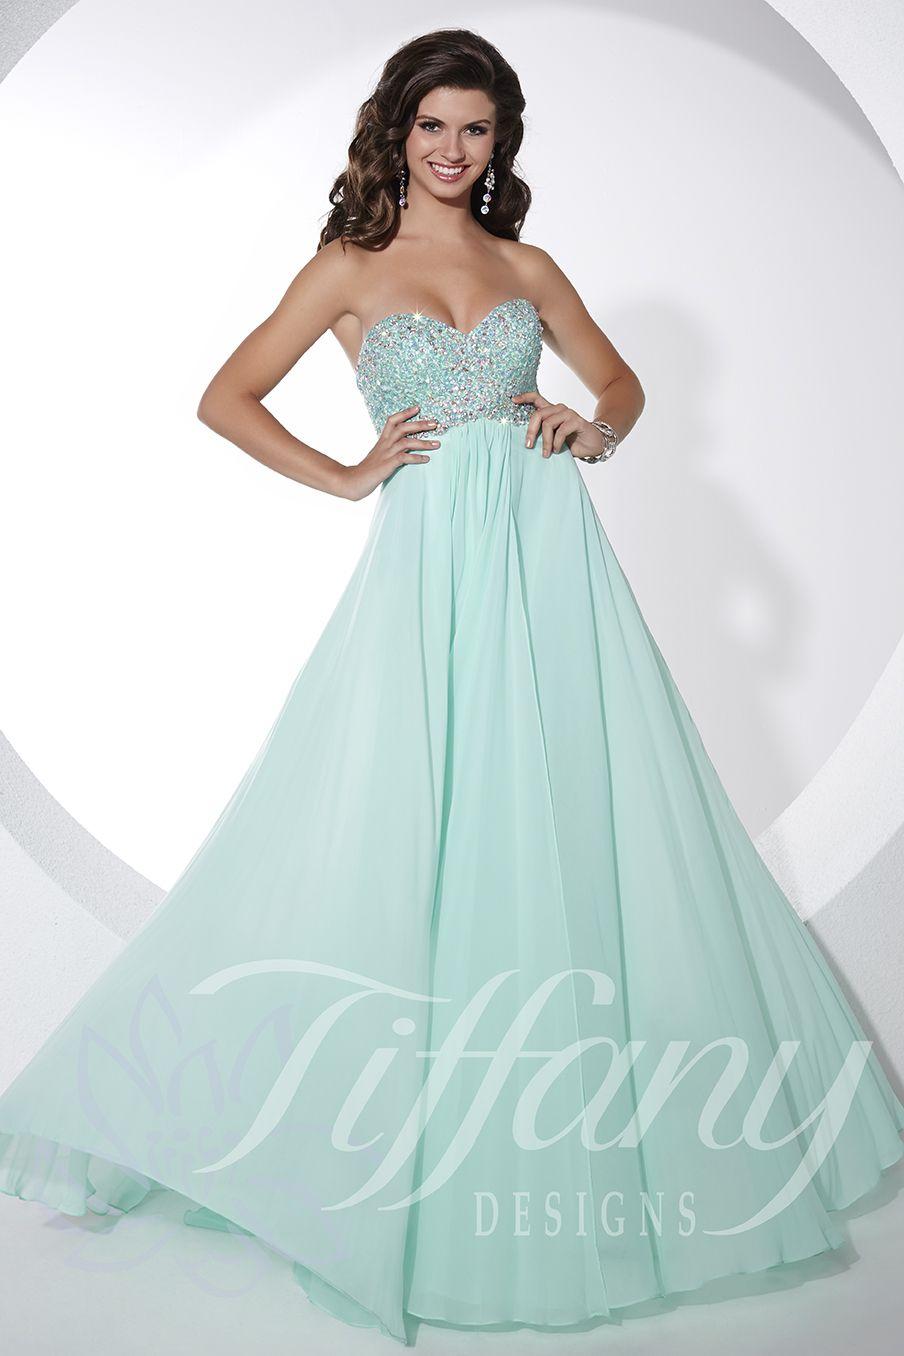 Tiffany Prom 2015